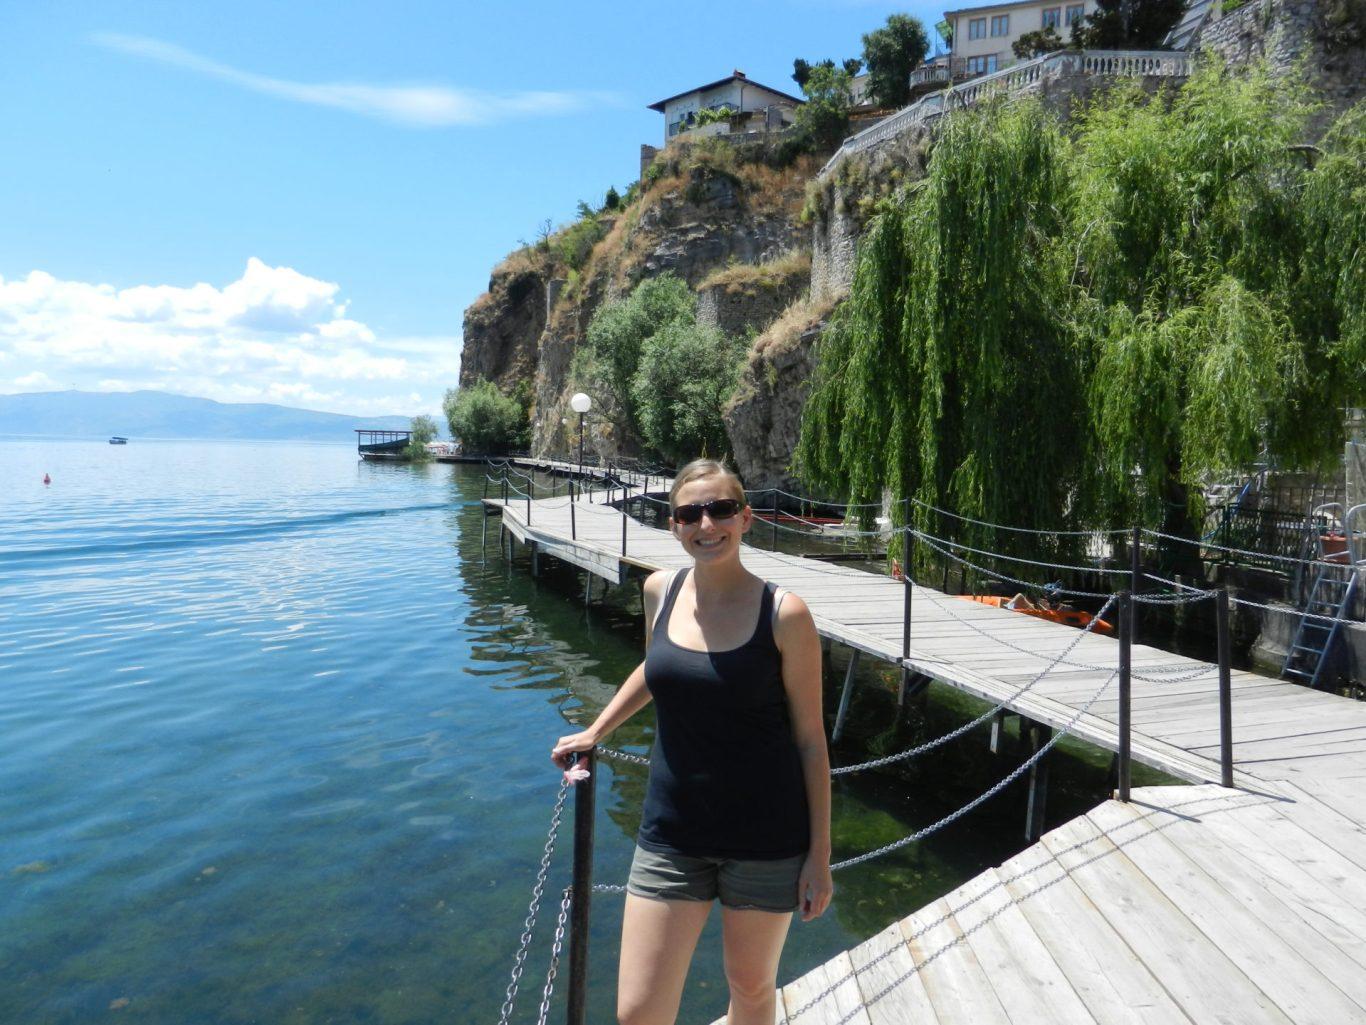 Waterfront walkways in Ohrid, Macedonia